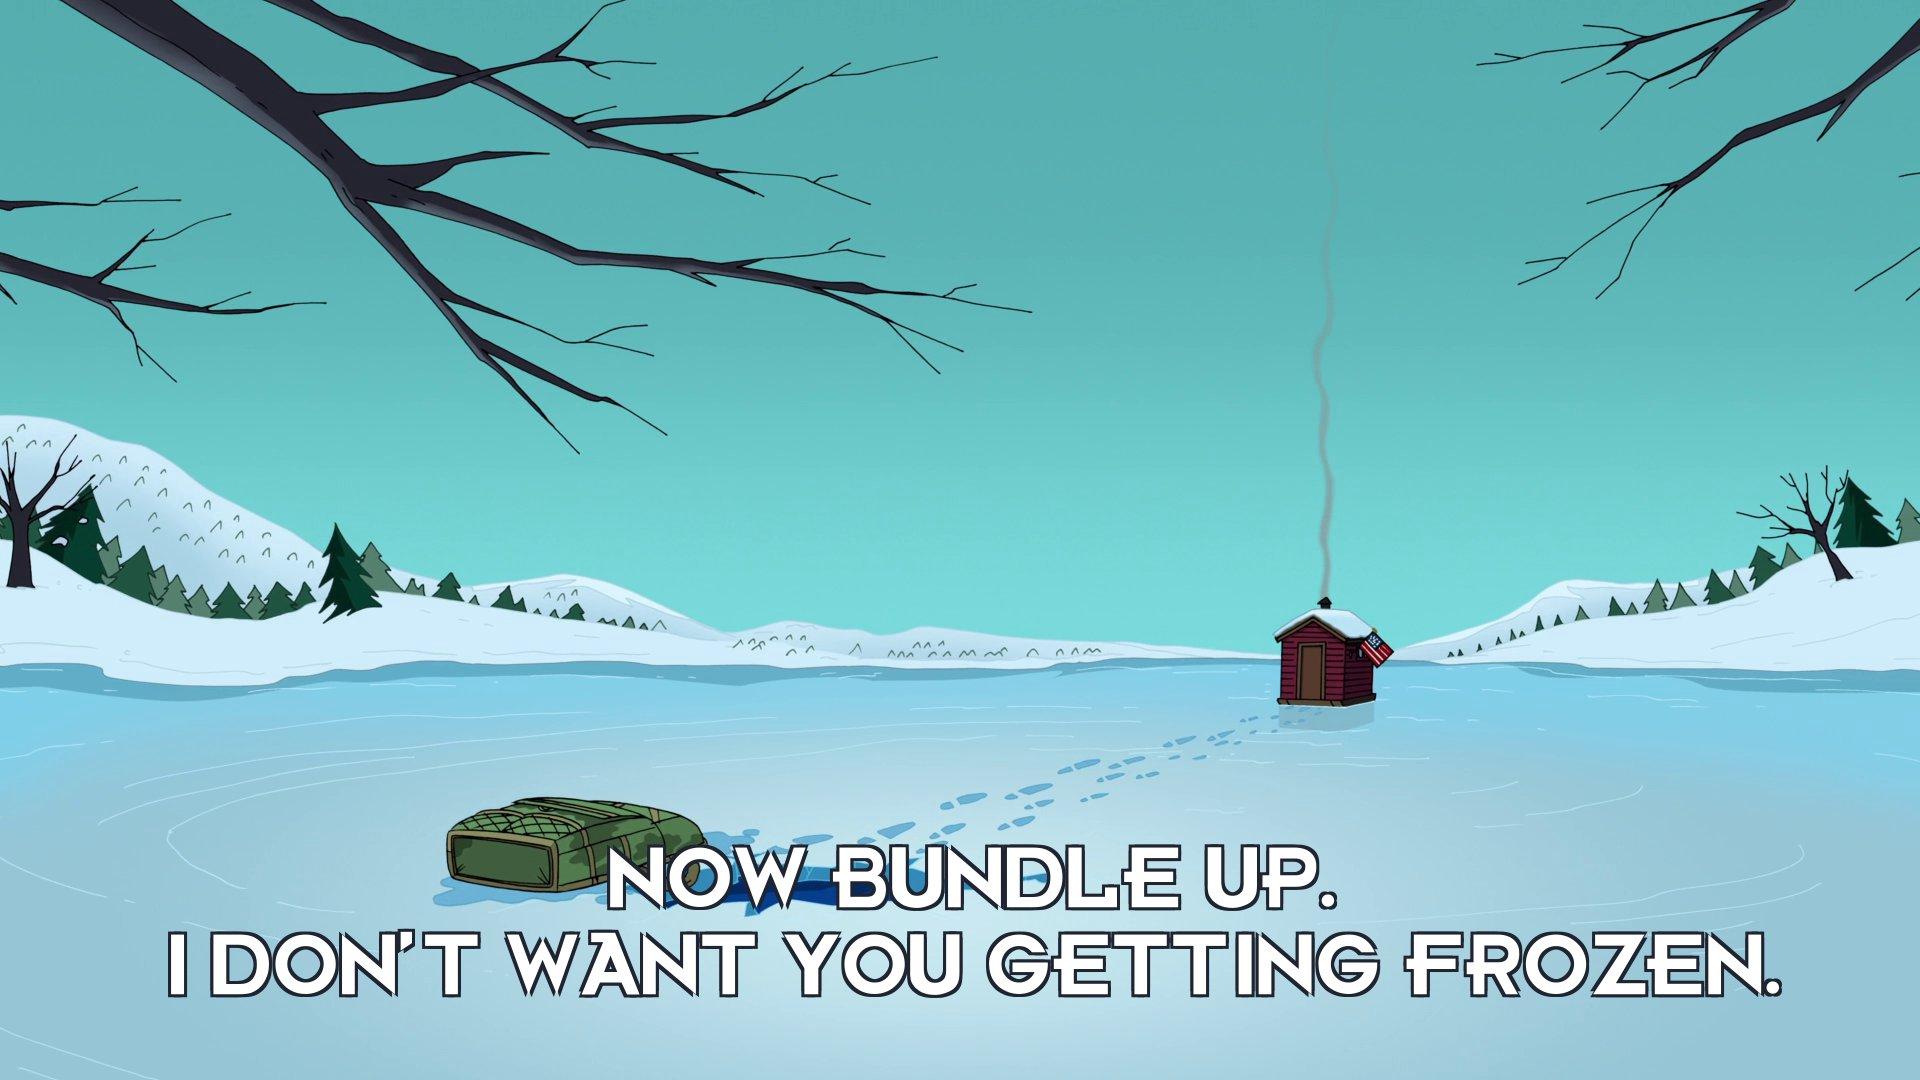 Yancy Fry Sr: Now bundle up. I don't want you getting frozen.